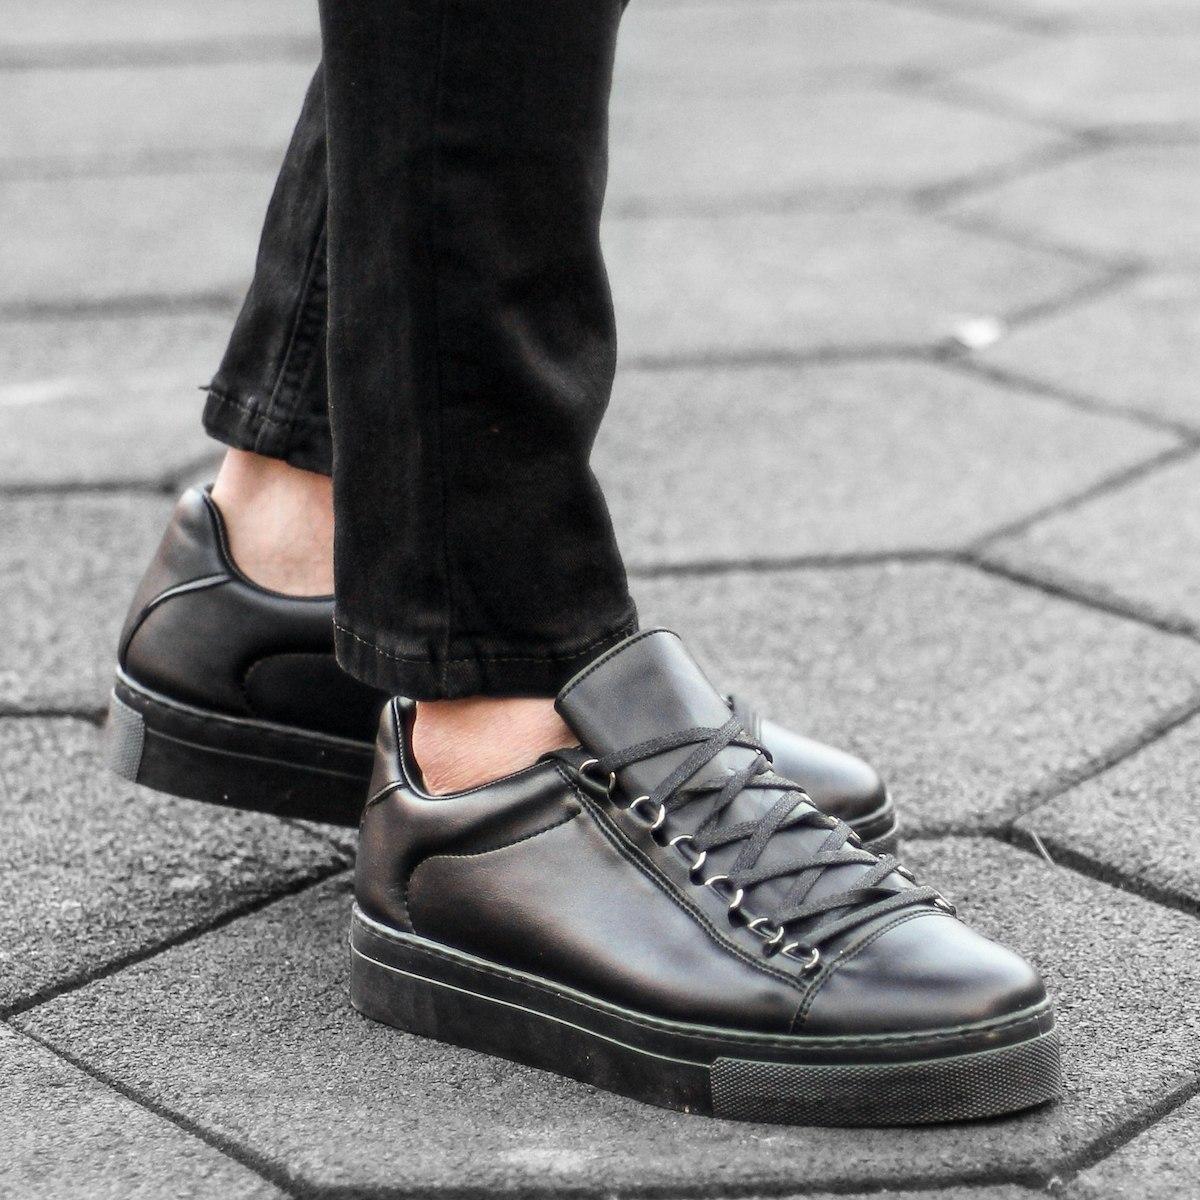 Uomo Basse Outdoor Sneakers Scarpe Nero